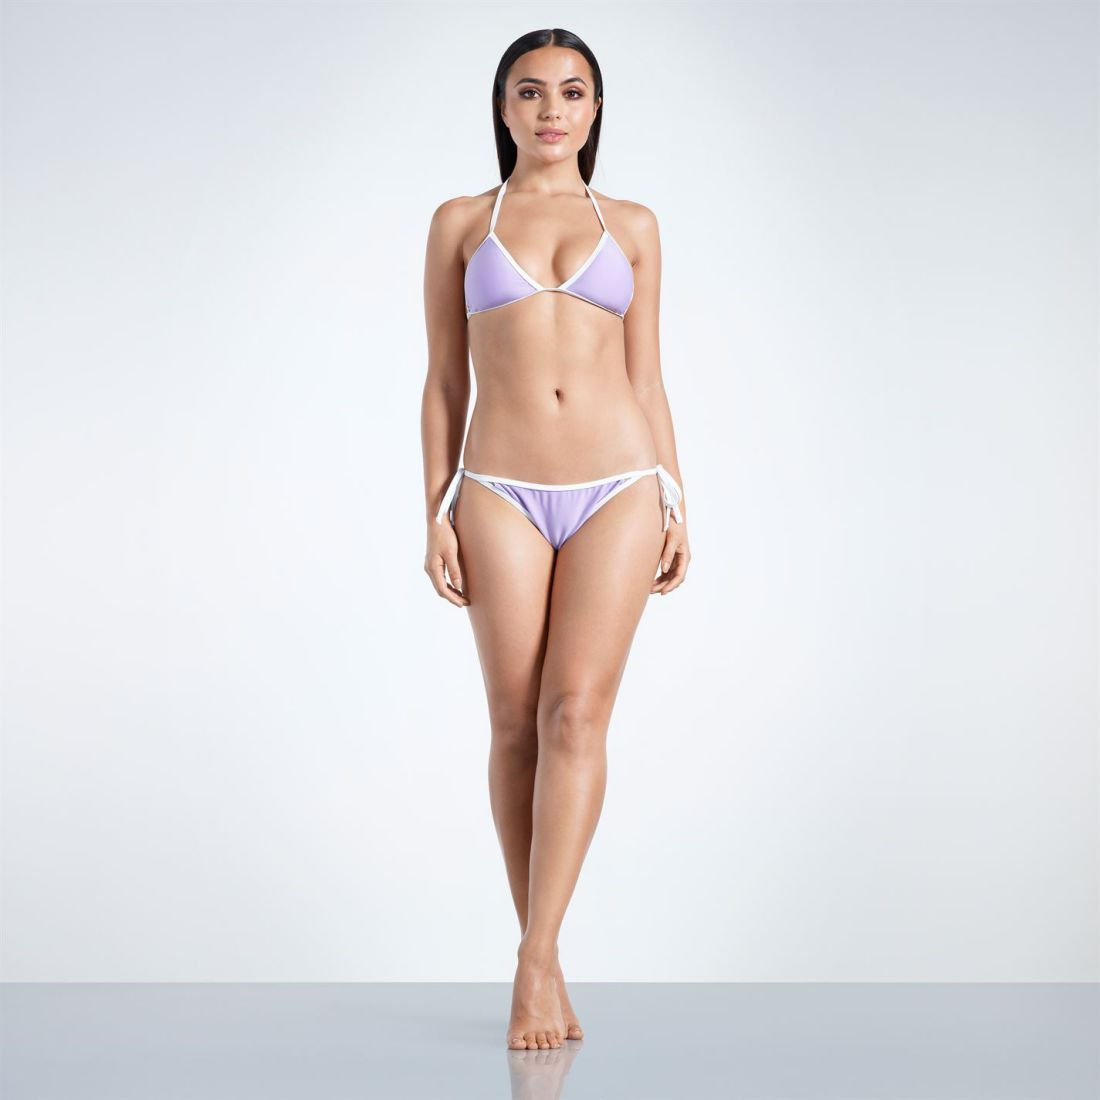 083334a5f5 Image is loading Golddigga-Triangle-Bikini-Bottoms-Ladies -Briefs-Stretch-Tie-